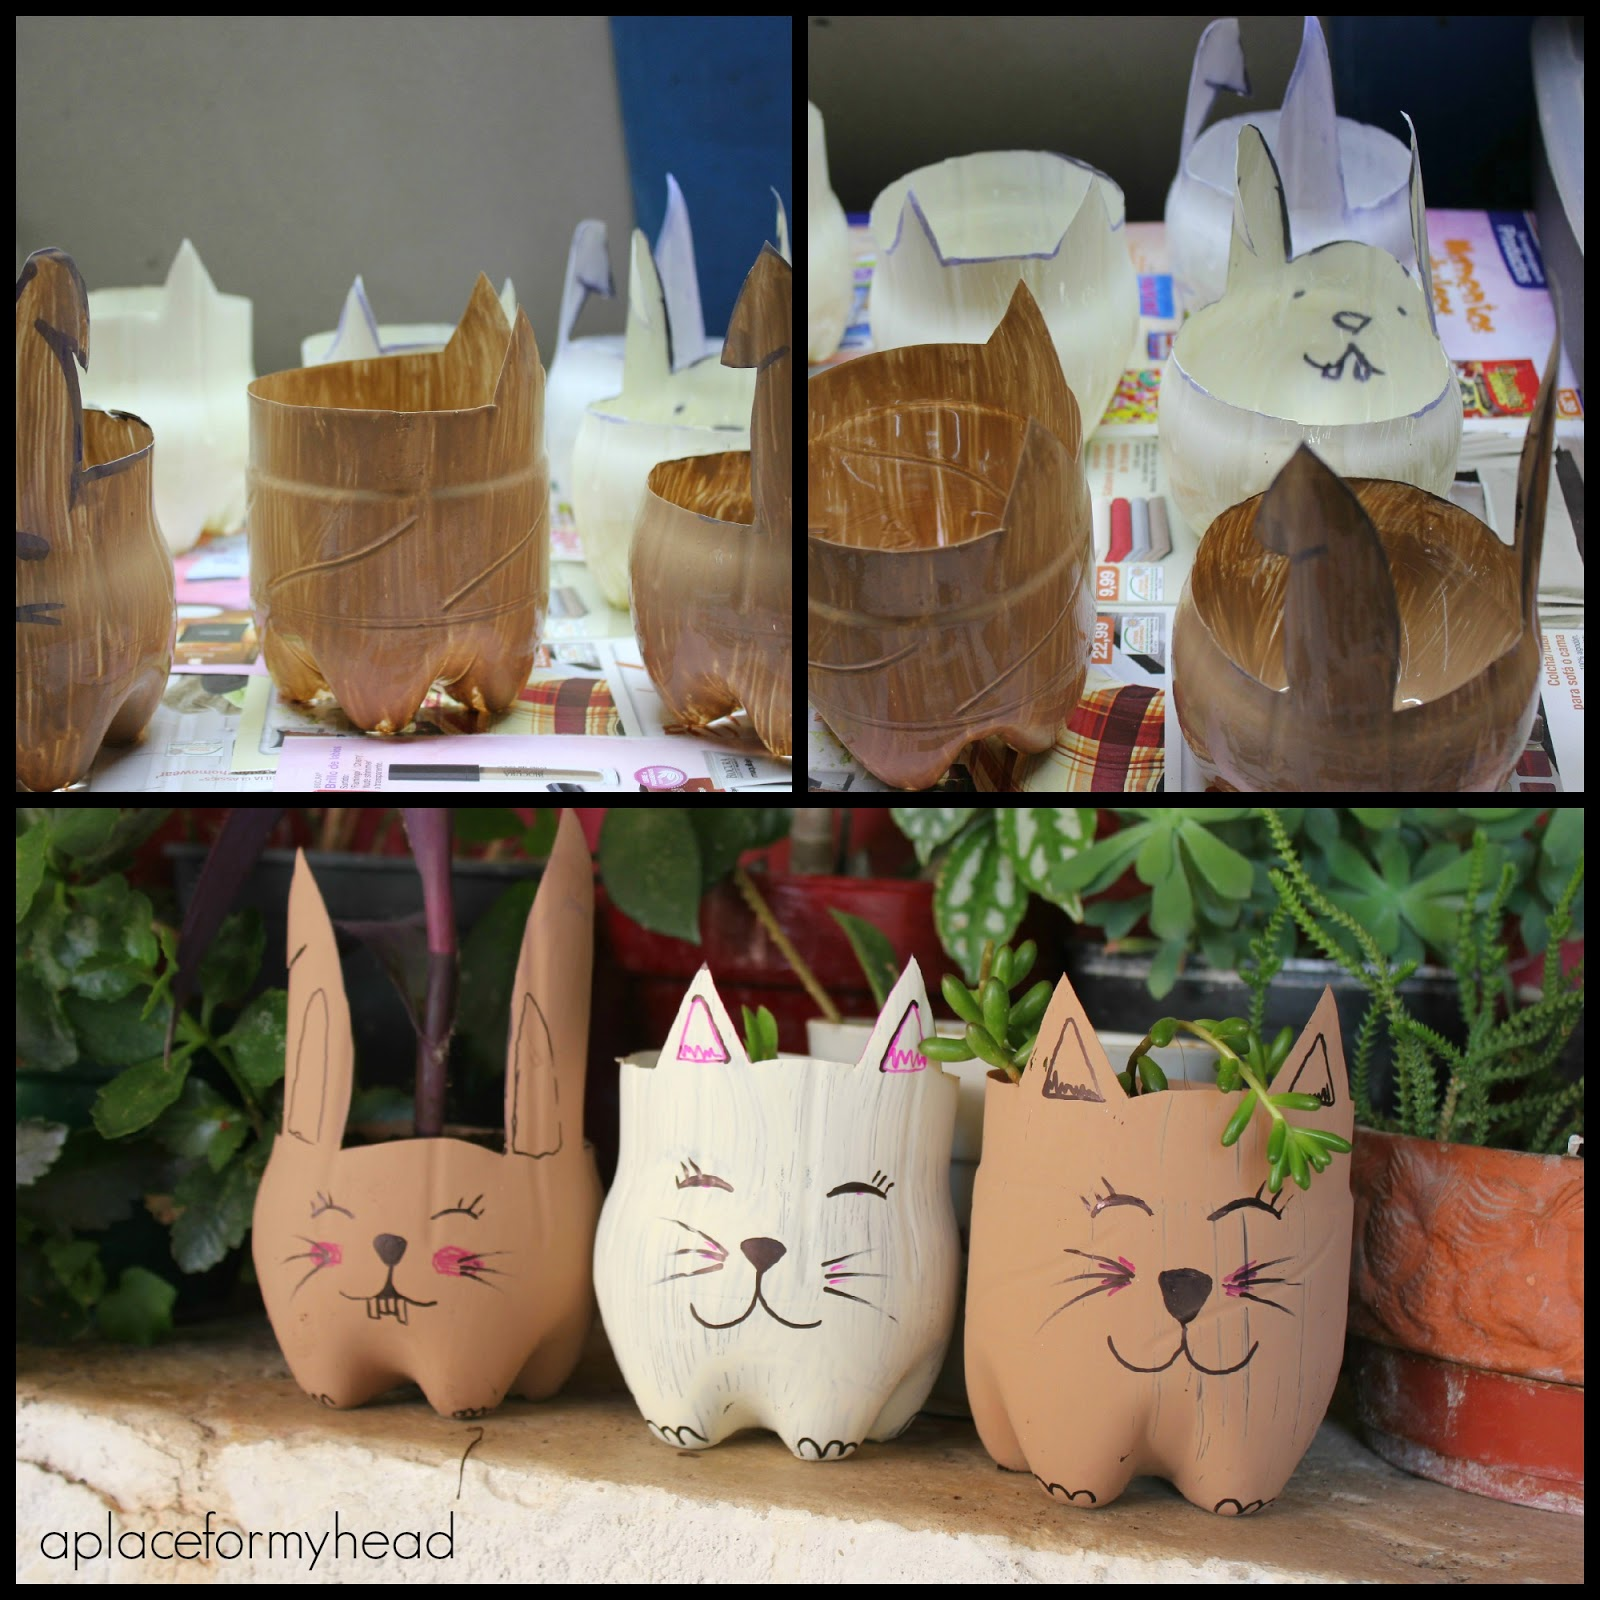 Diy de botellas a macetas a place for my head - Handmade decorative ideas for home ...